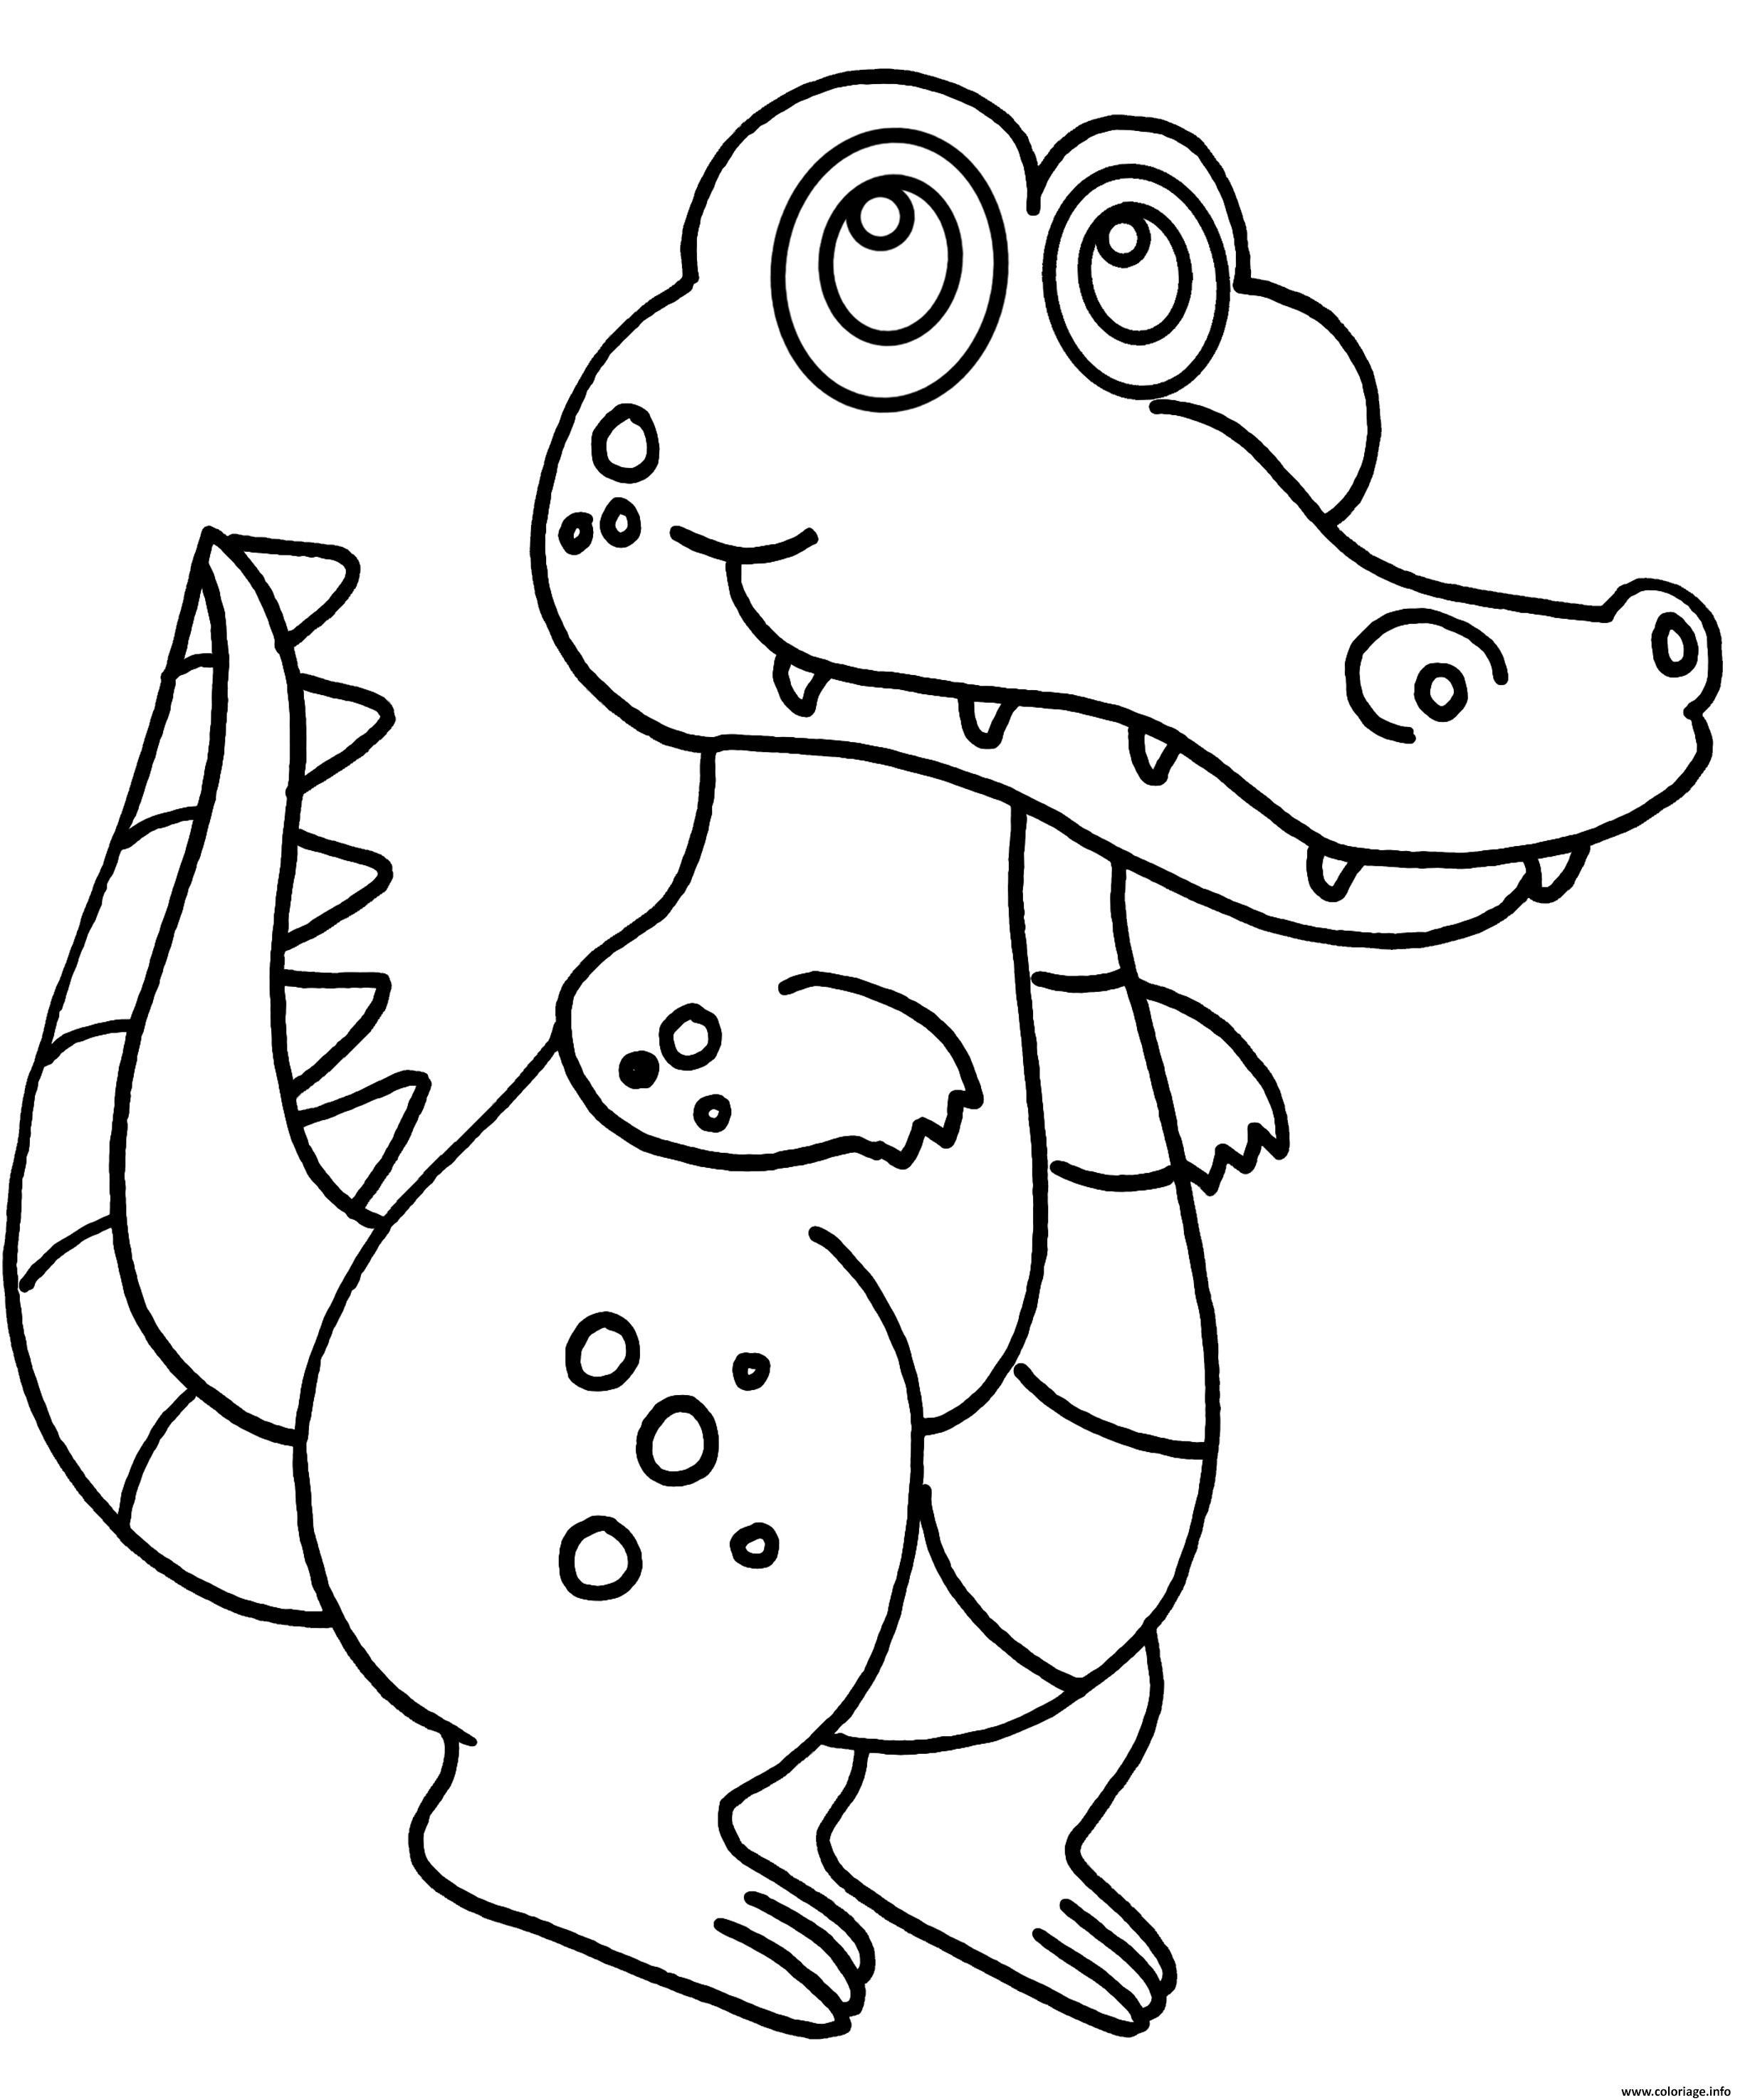 Coloriage Bebe Crocodile Marrant Dessin Crocodile A Imprimer